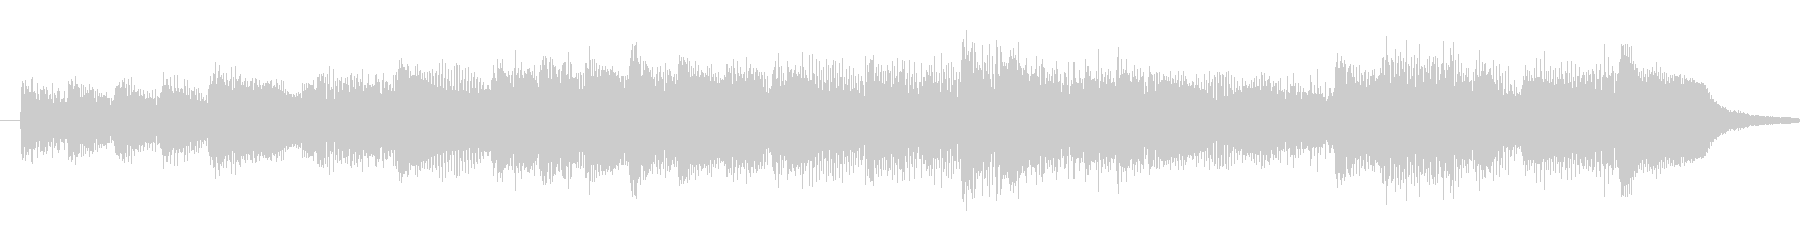 Refreshing piano opening jingle's unreproduced waveform